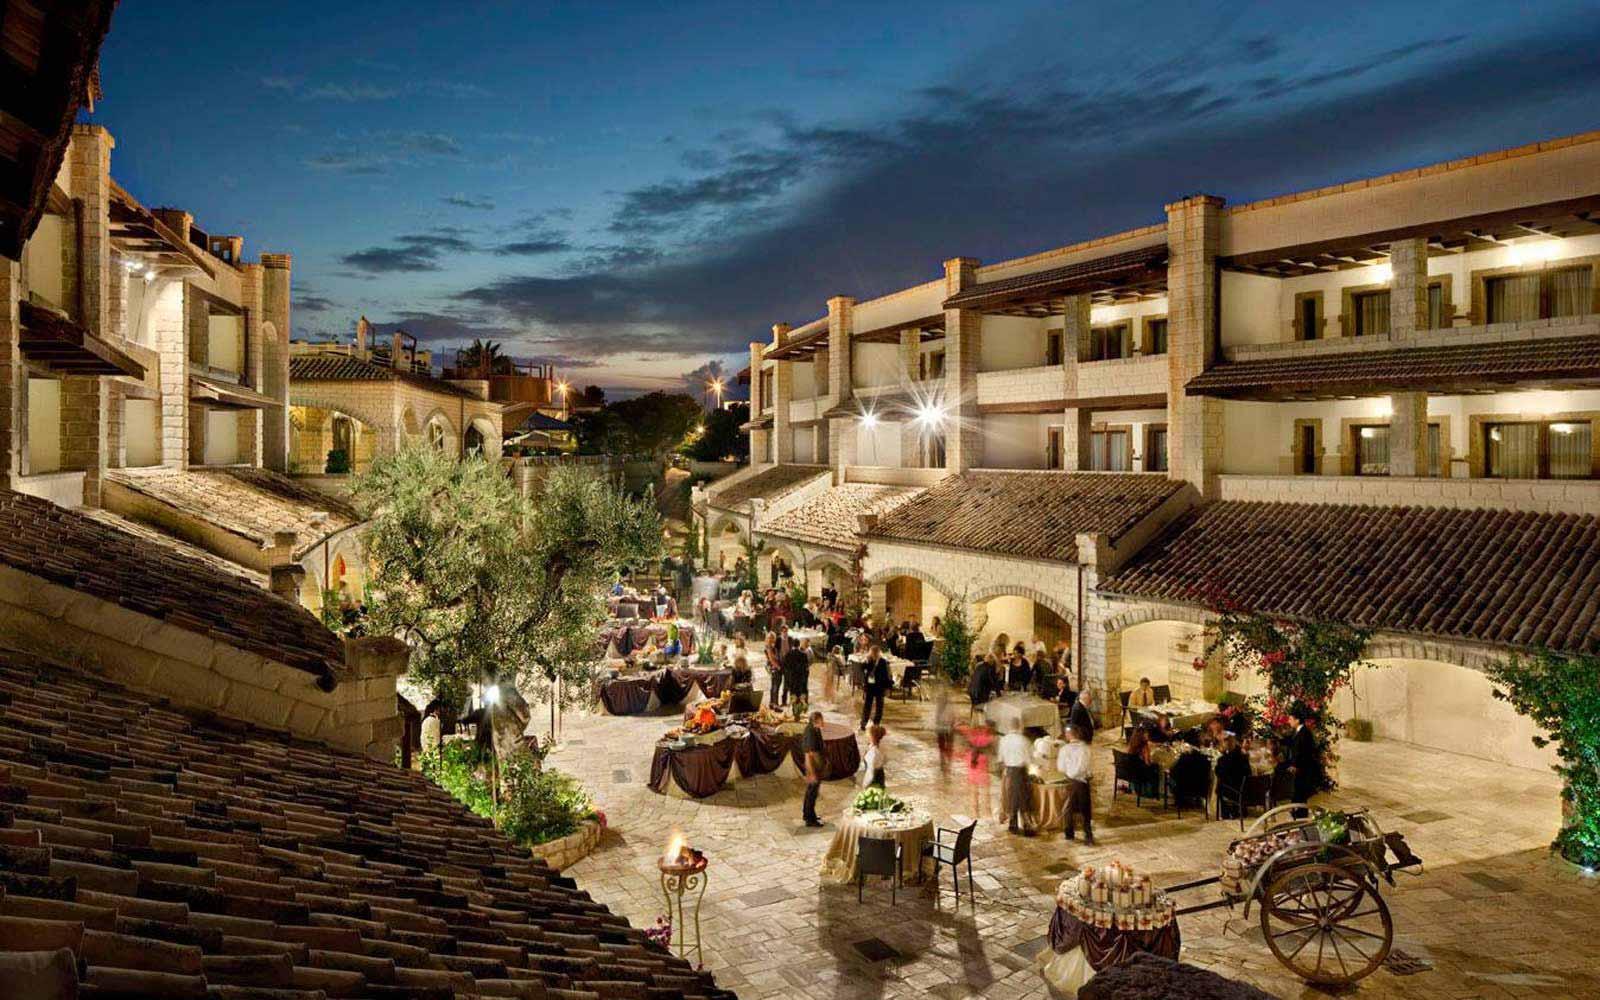 Internal courtyard at UNA Hotel Regina